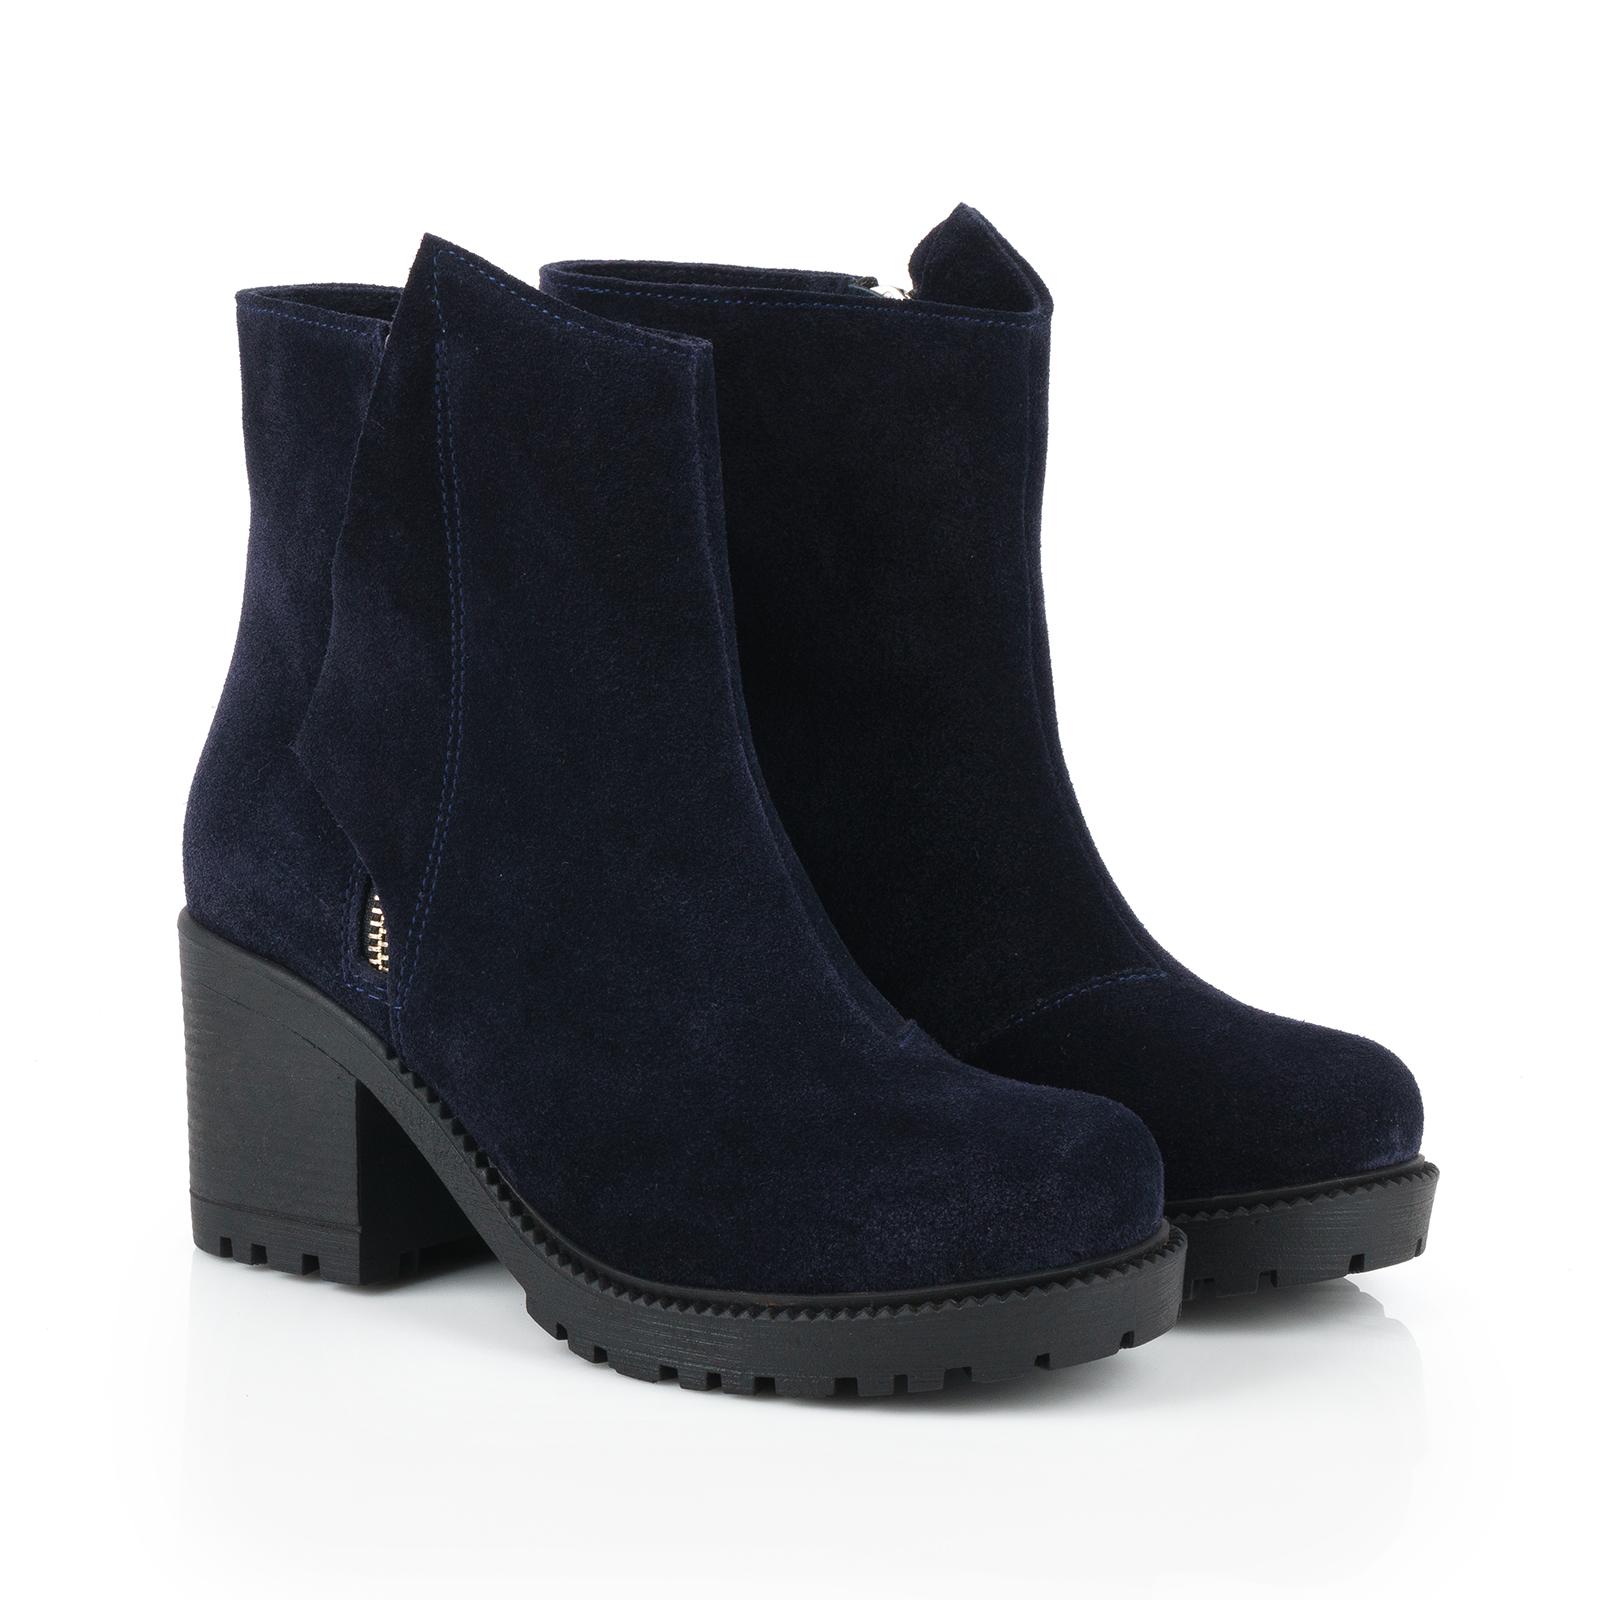 Ботинки женские Ботинки Молния замша синие на байке 100176 размерная сетка обуви, 2017